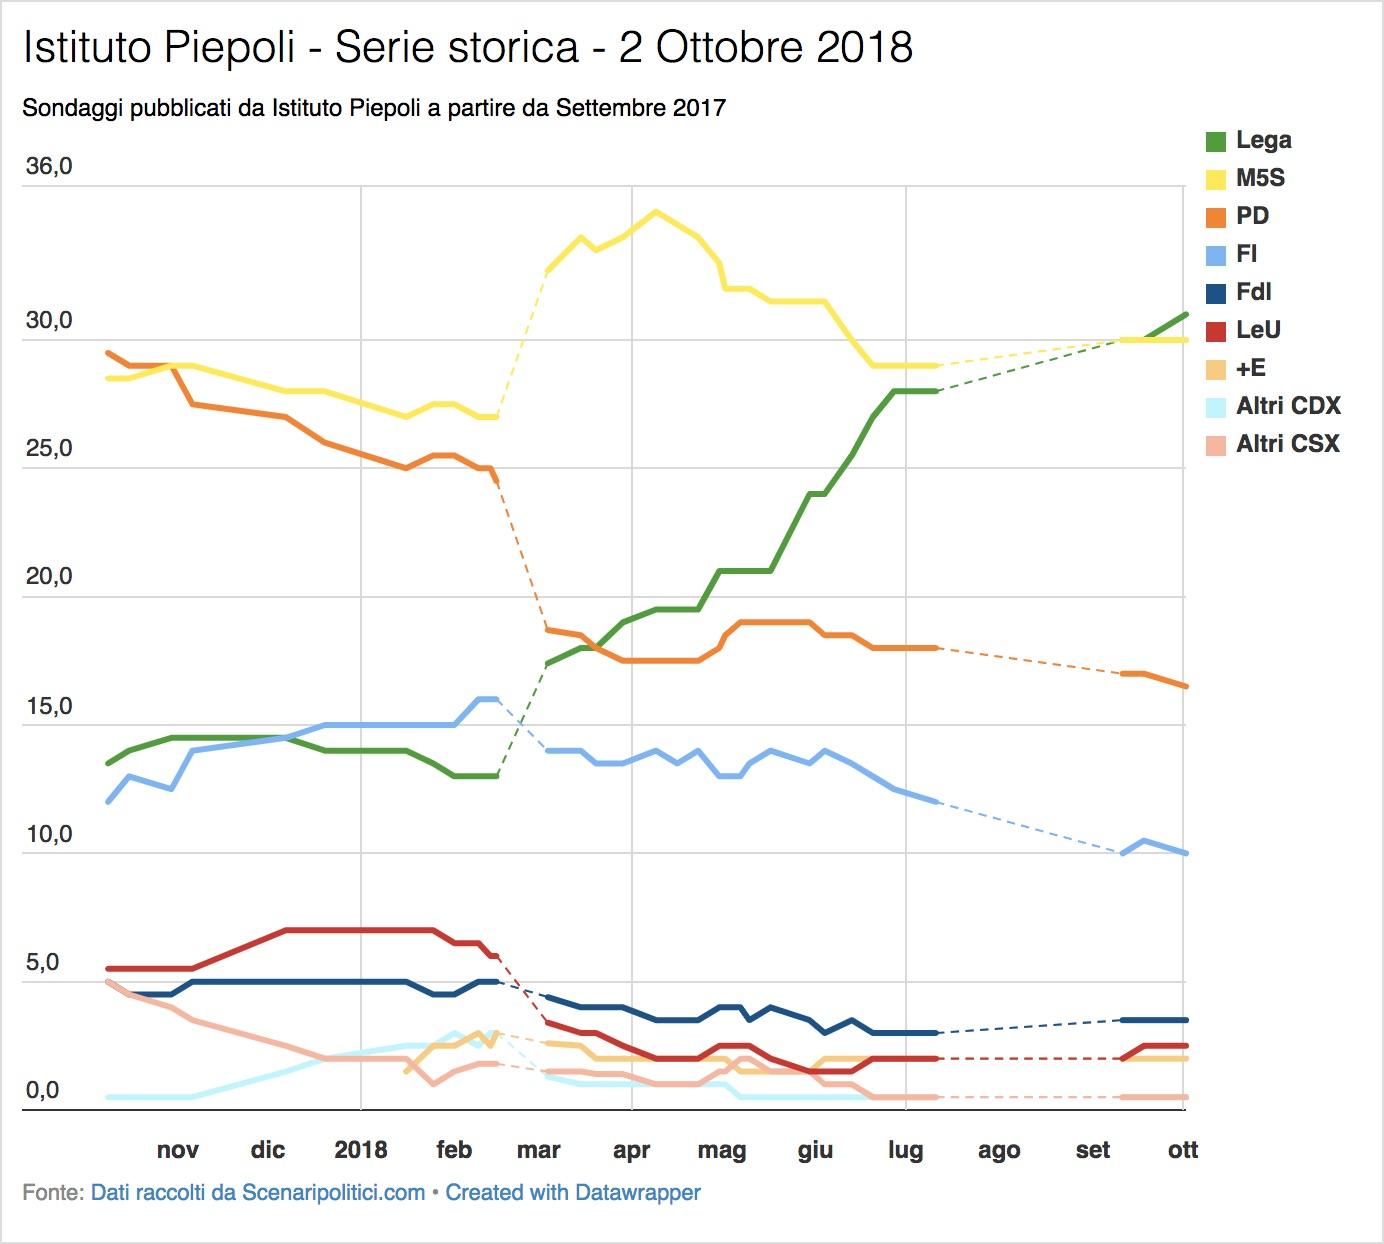 Sondaggi Euromedia Research & Piepoli (2 ottobre 2018)